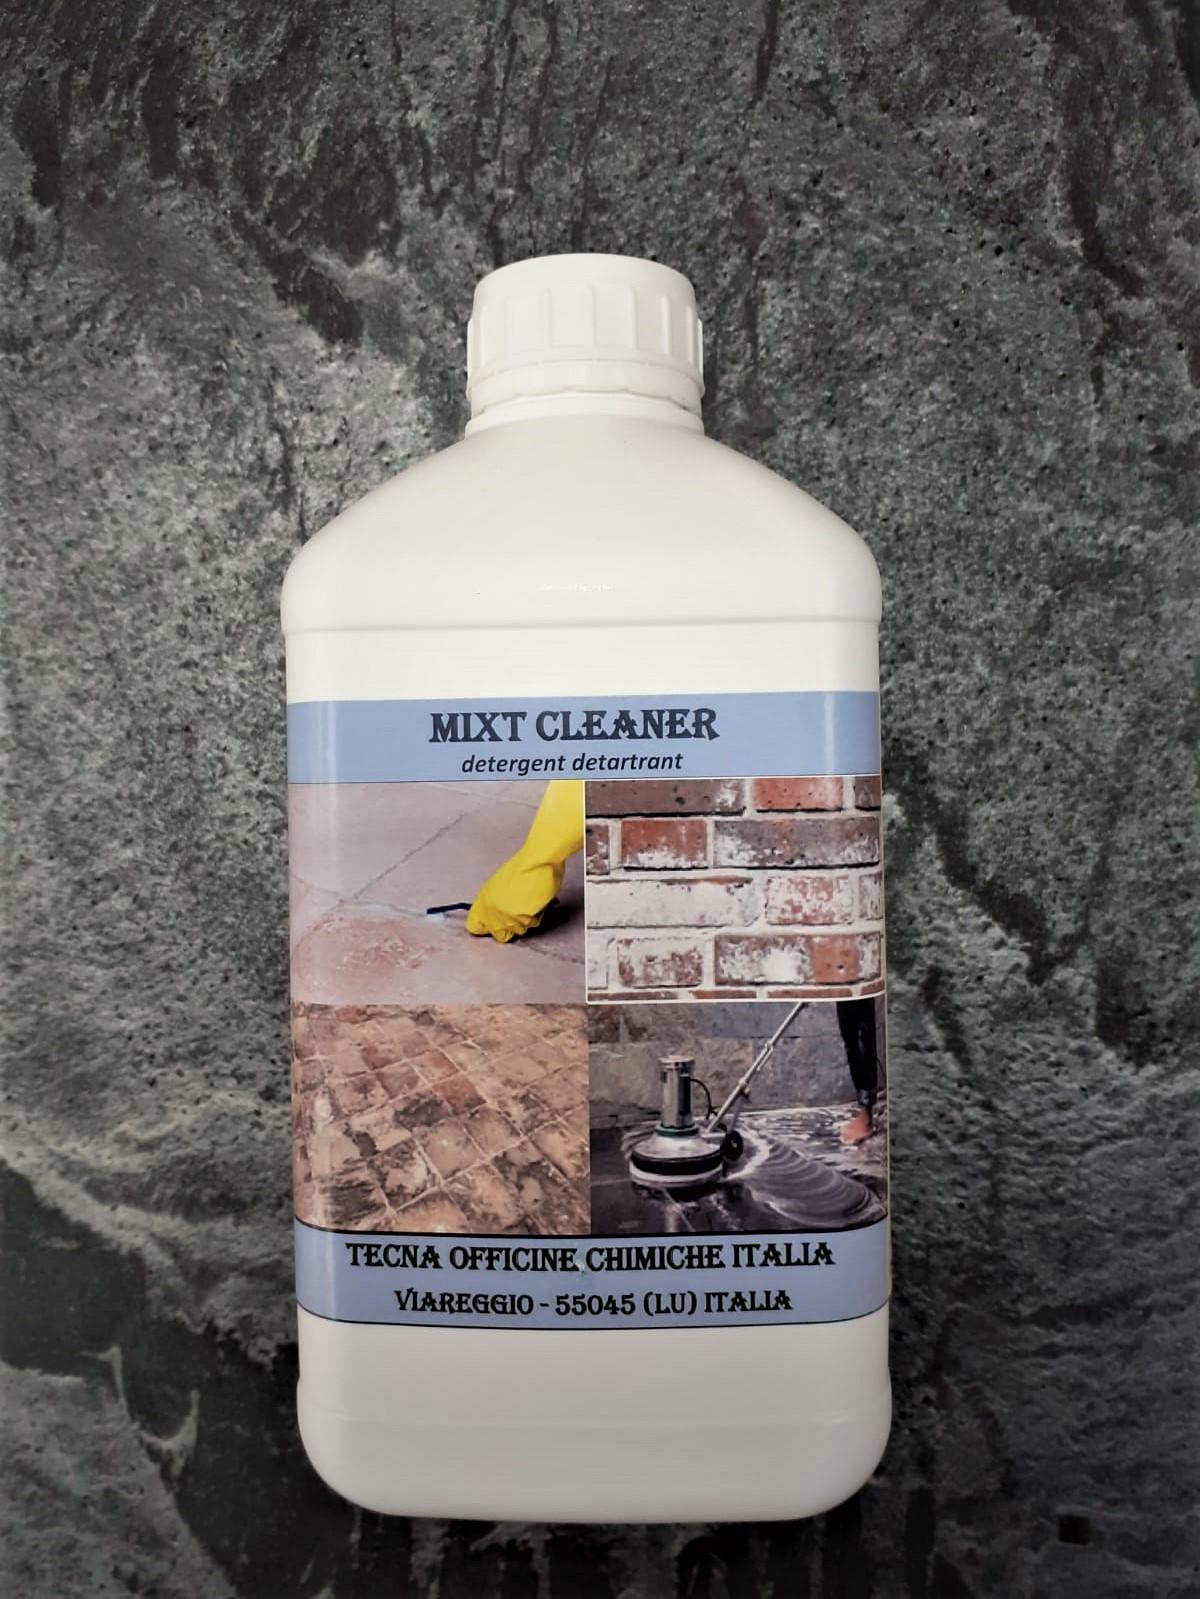 detergent-detartrant-mixt-cleaner-1